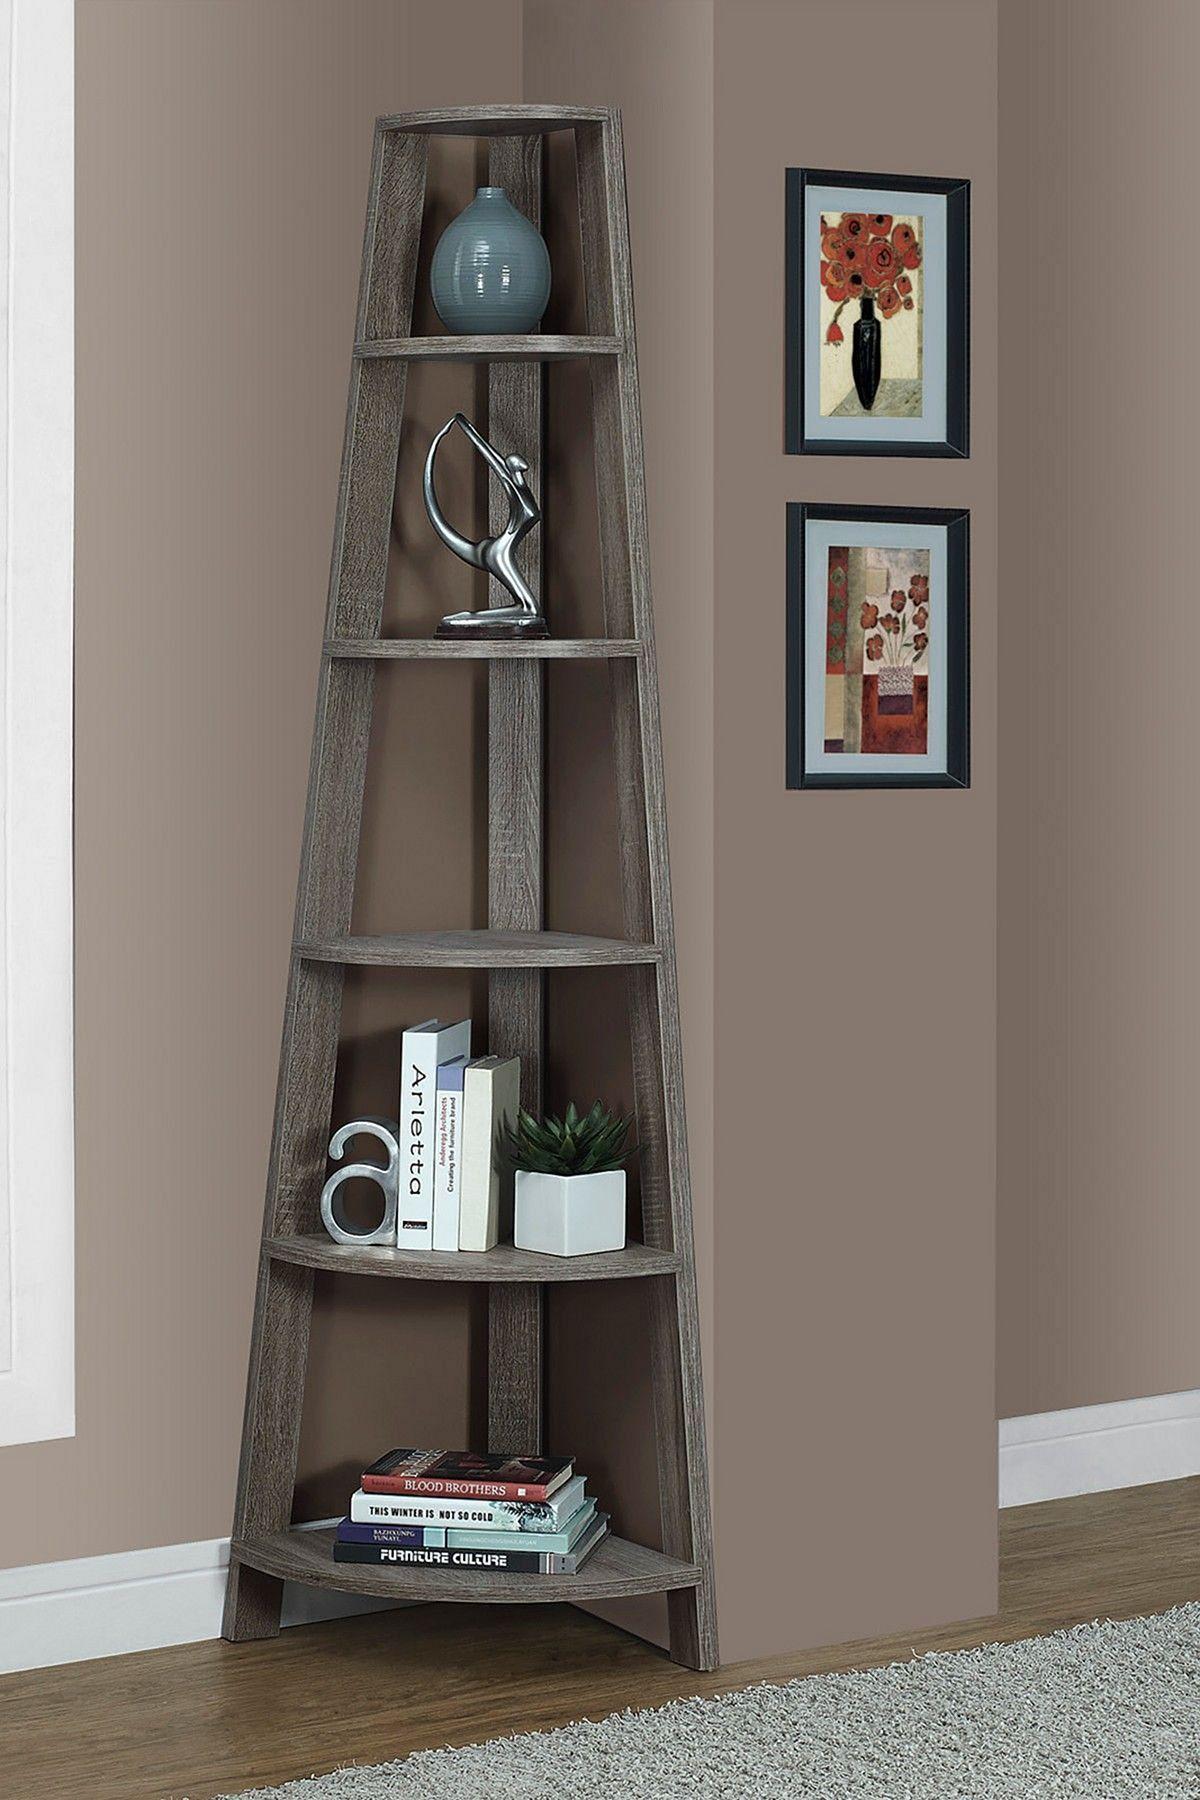 25 Best Living Room Shelves Design Ideas That You Need To Copy Meuble De Coin Decoration De Coin Etagere Salon